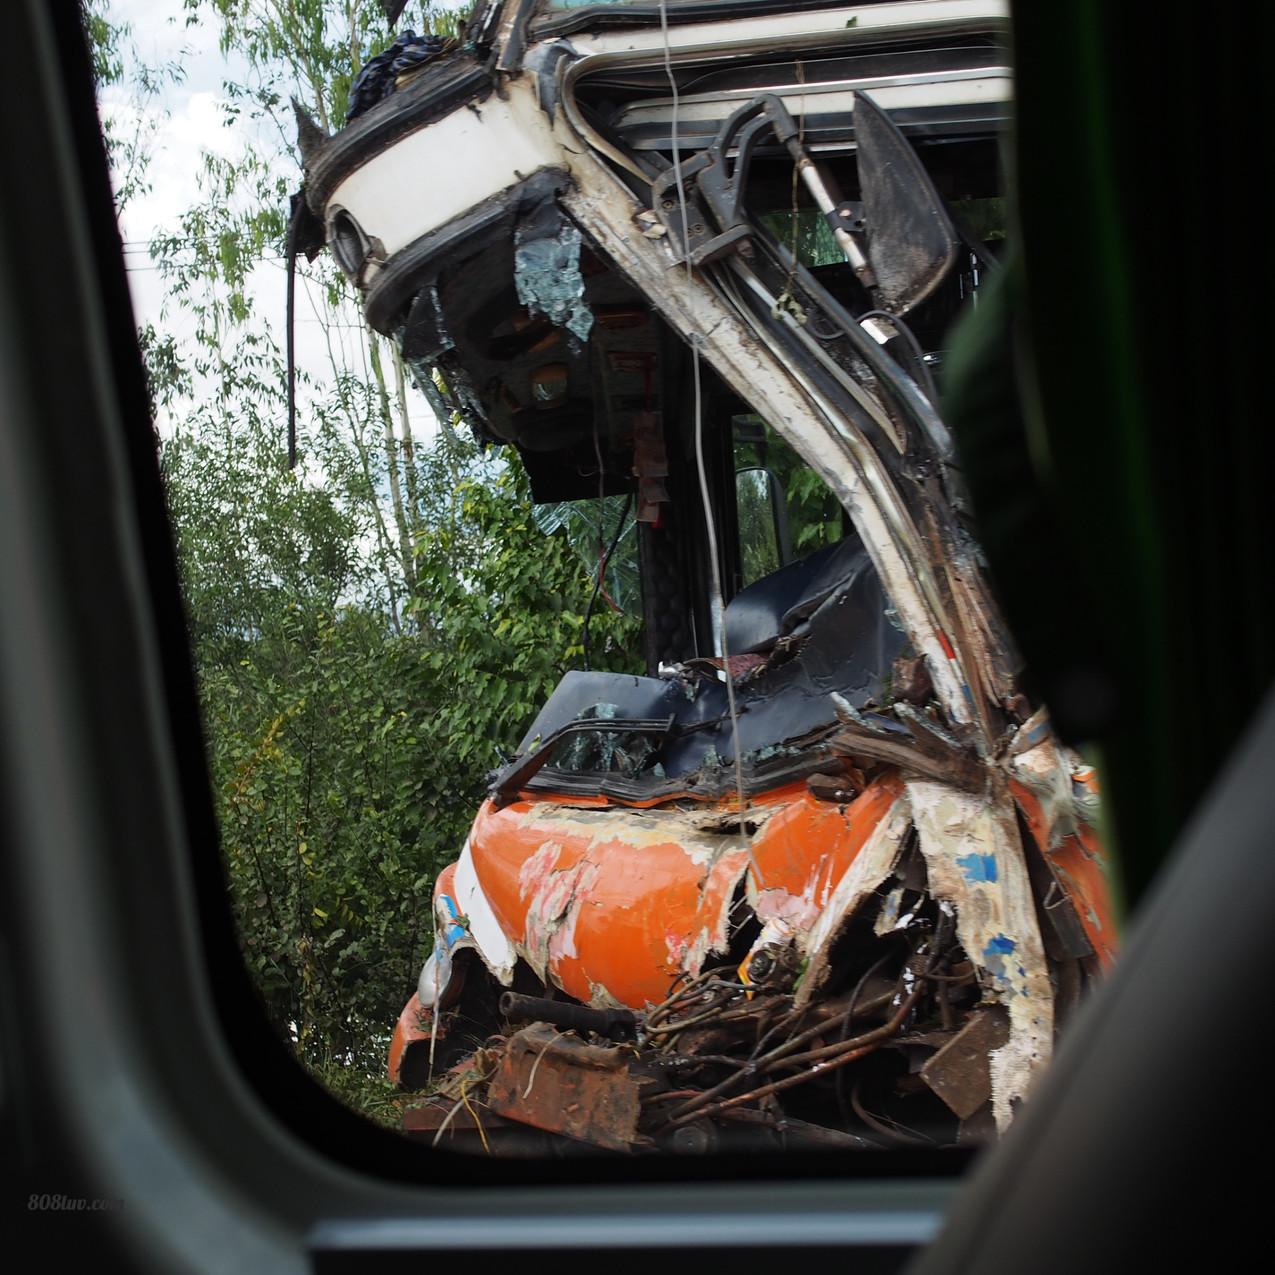 Crazy bus crash we drove by